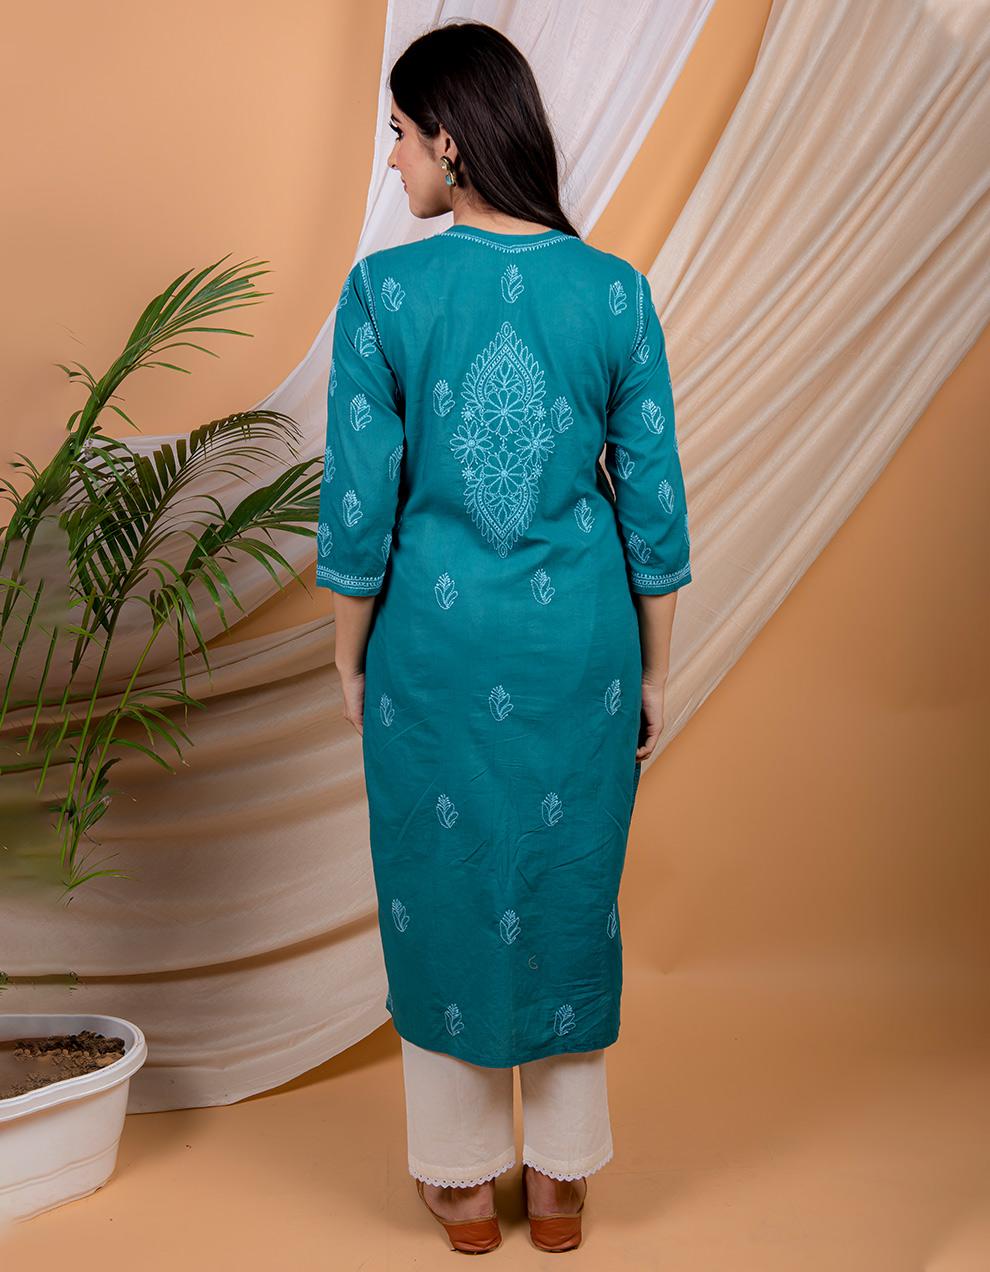 Buy best Fiza Teal blue chikankari cotton kurta designs in India